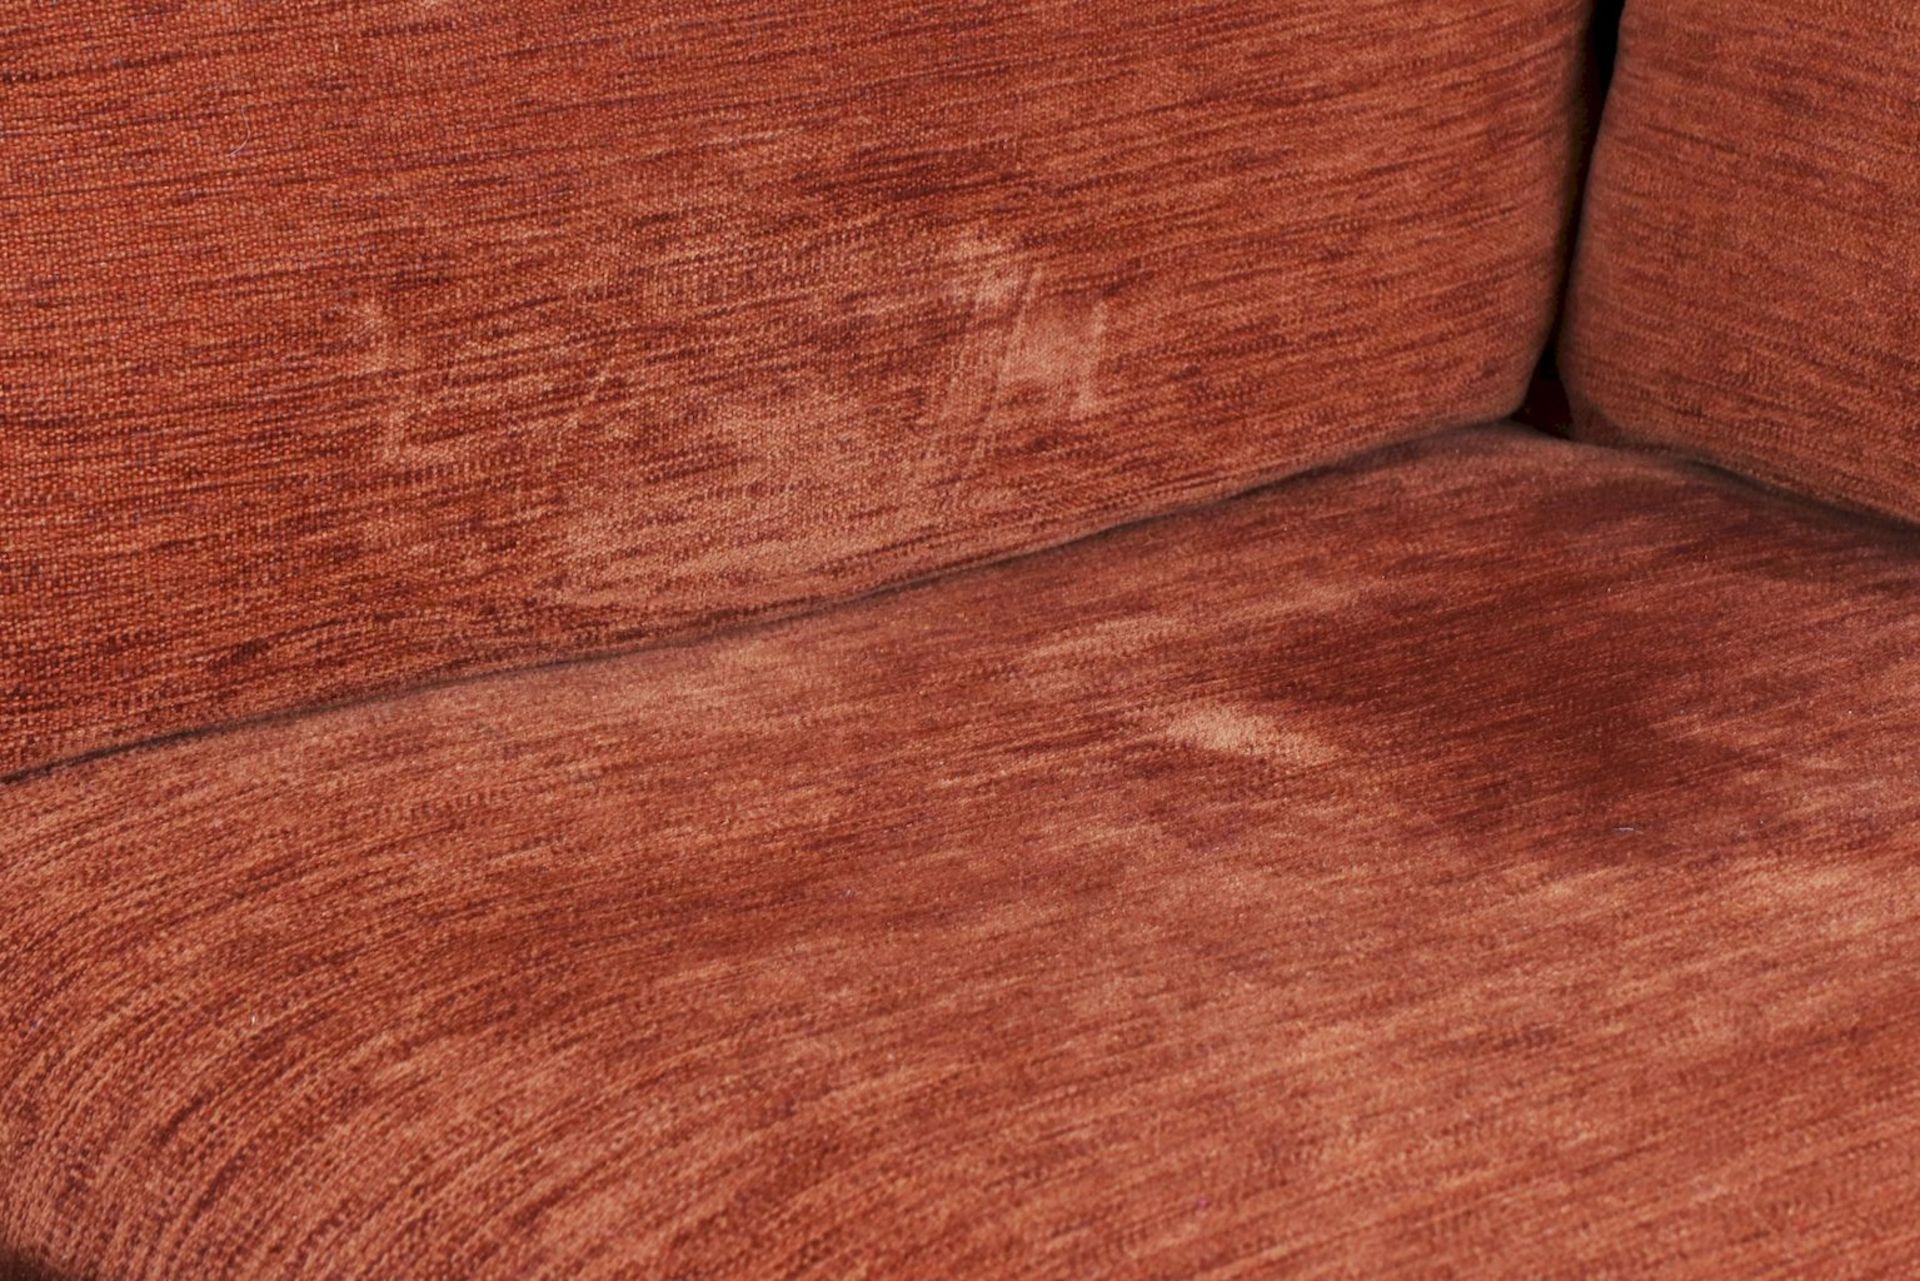 EDWARD BARBER & JAY OSGERBY Sofa ¨Mariposa¨ (2014) - Image 6 of 6